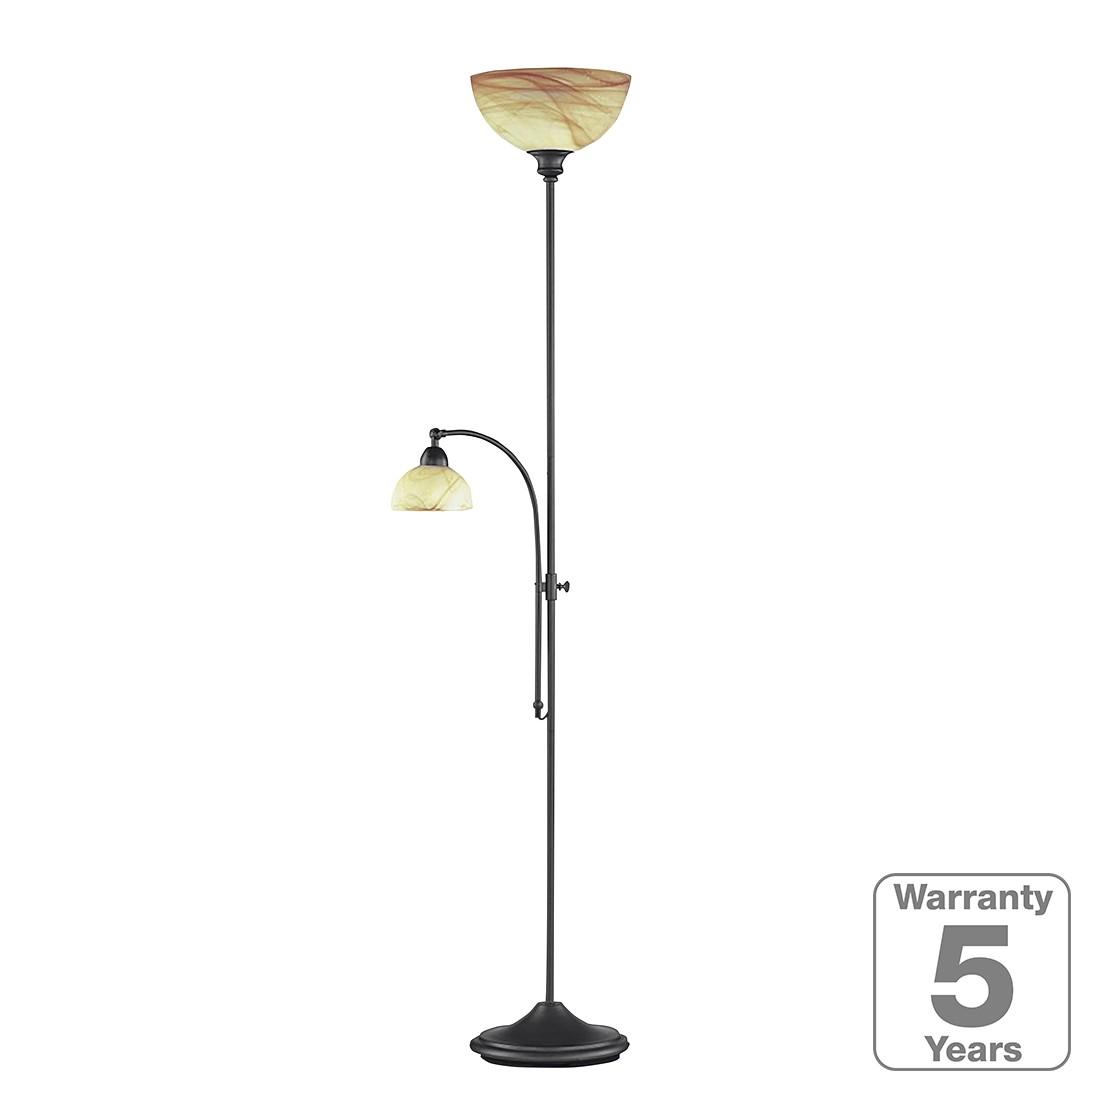 energie  A++, Staande lamp met leeslamp Lacchino - 2 lichtbronnen, Wofi